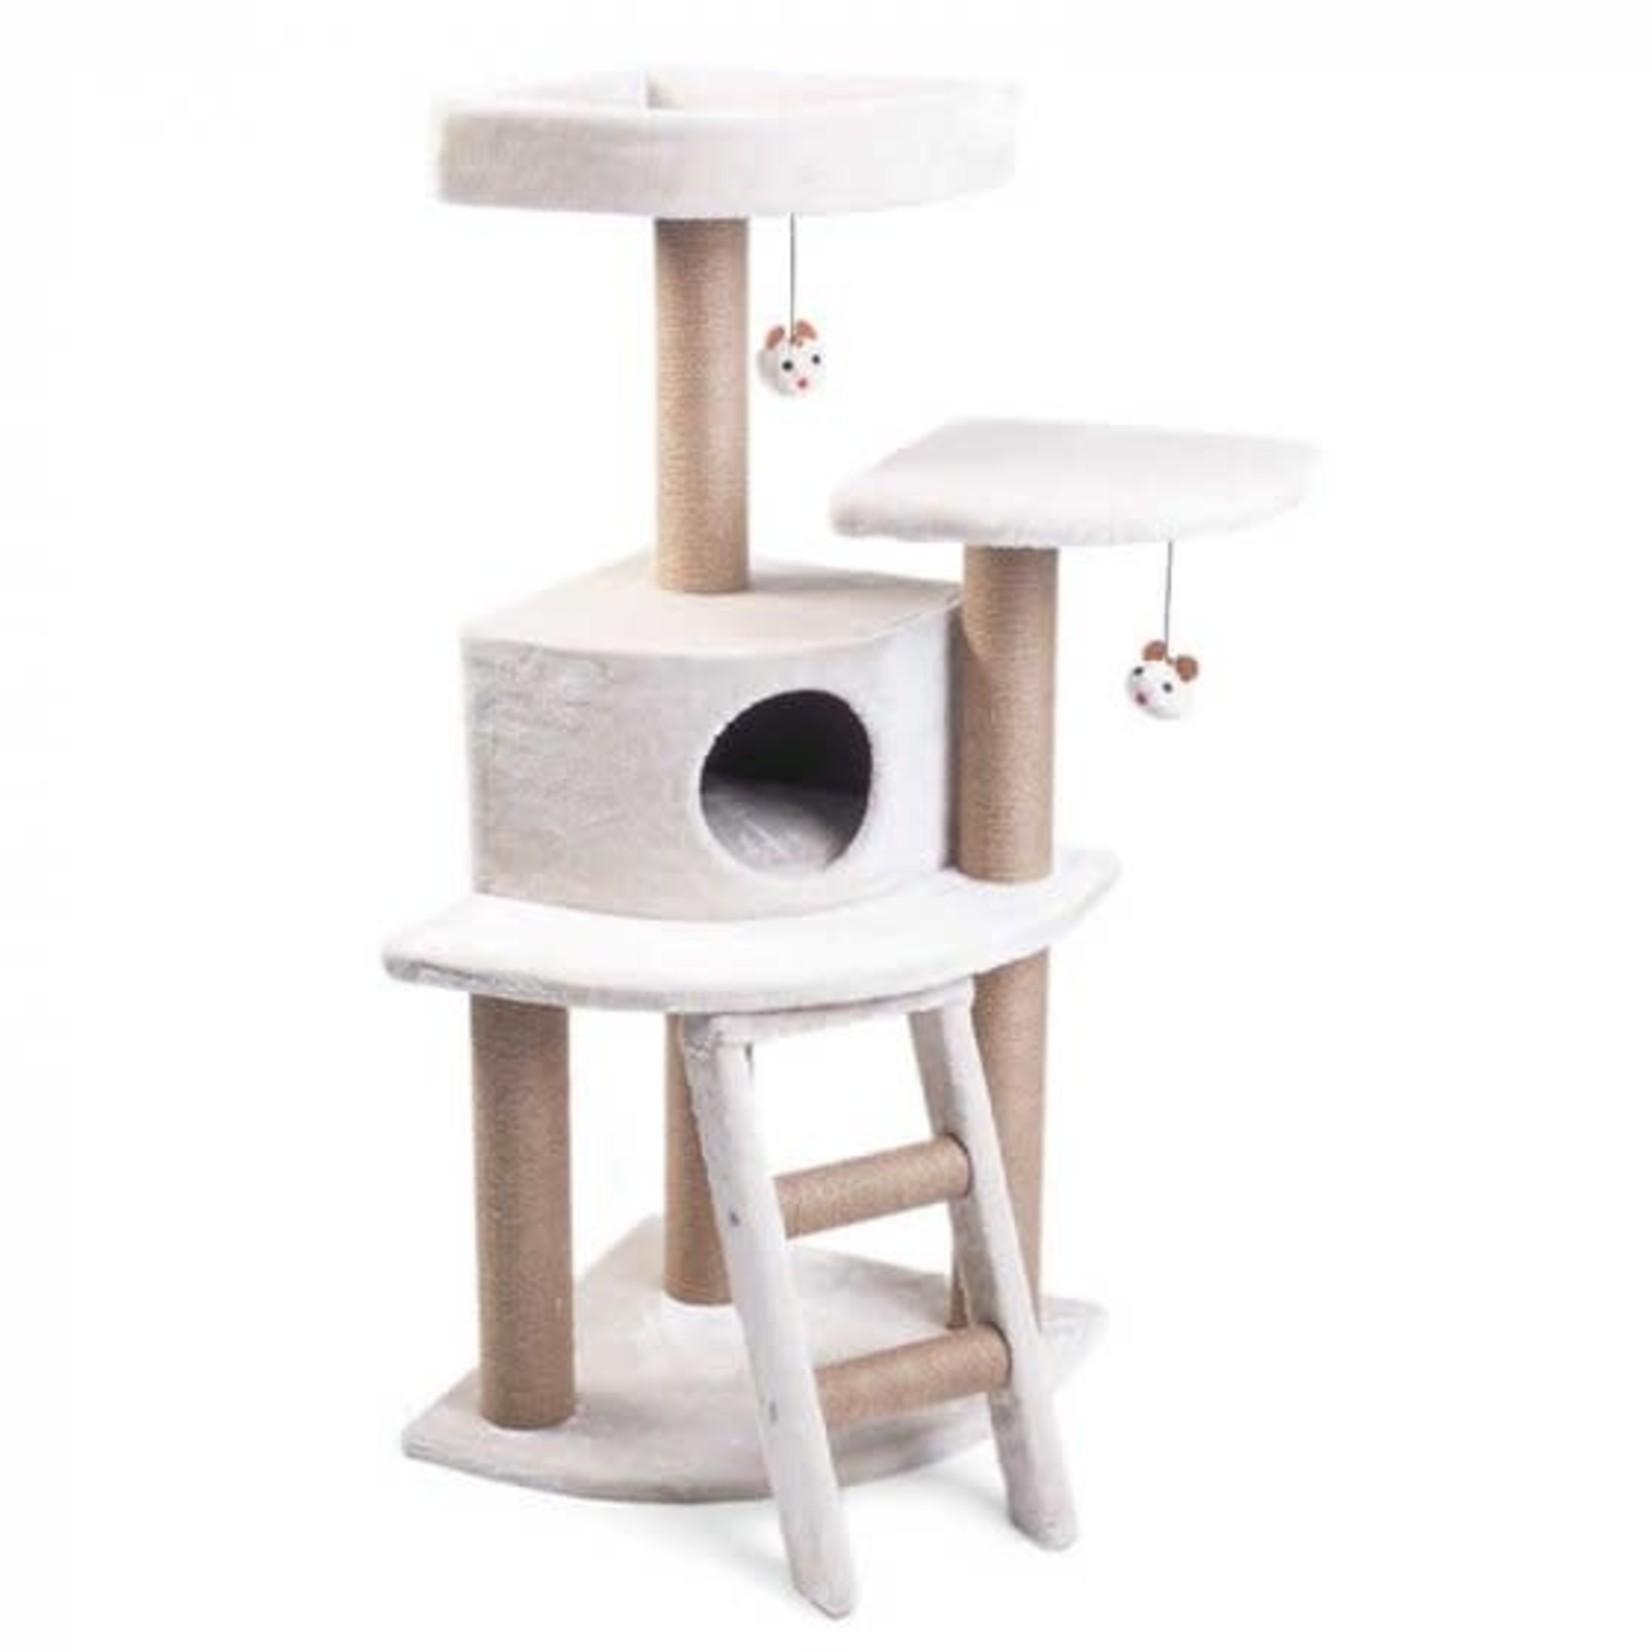 Zöon Deluxe Corner House CatZone Cat Scratching Post, 1.2m